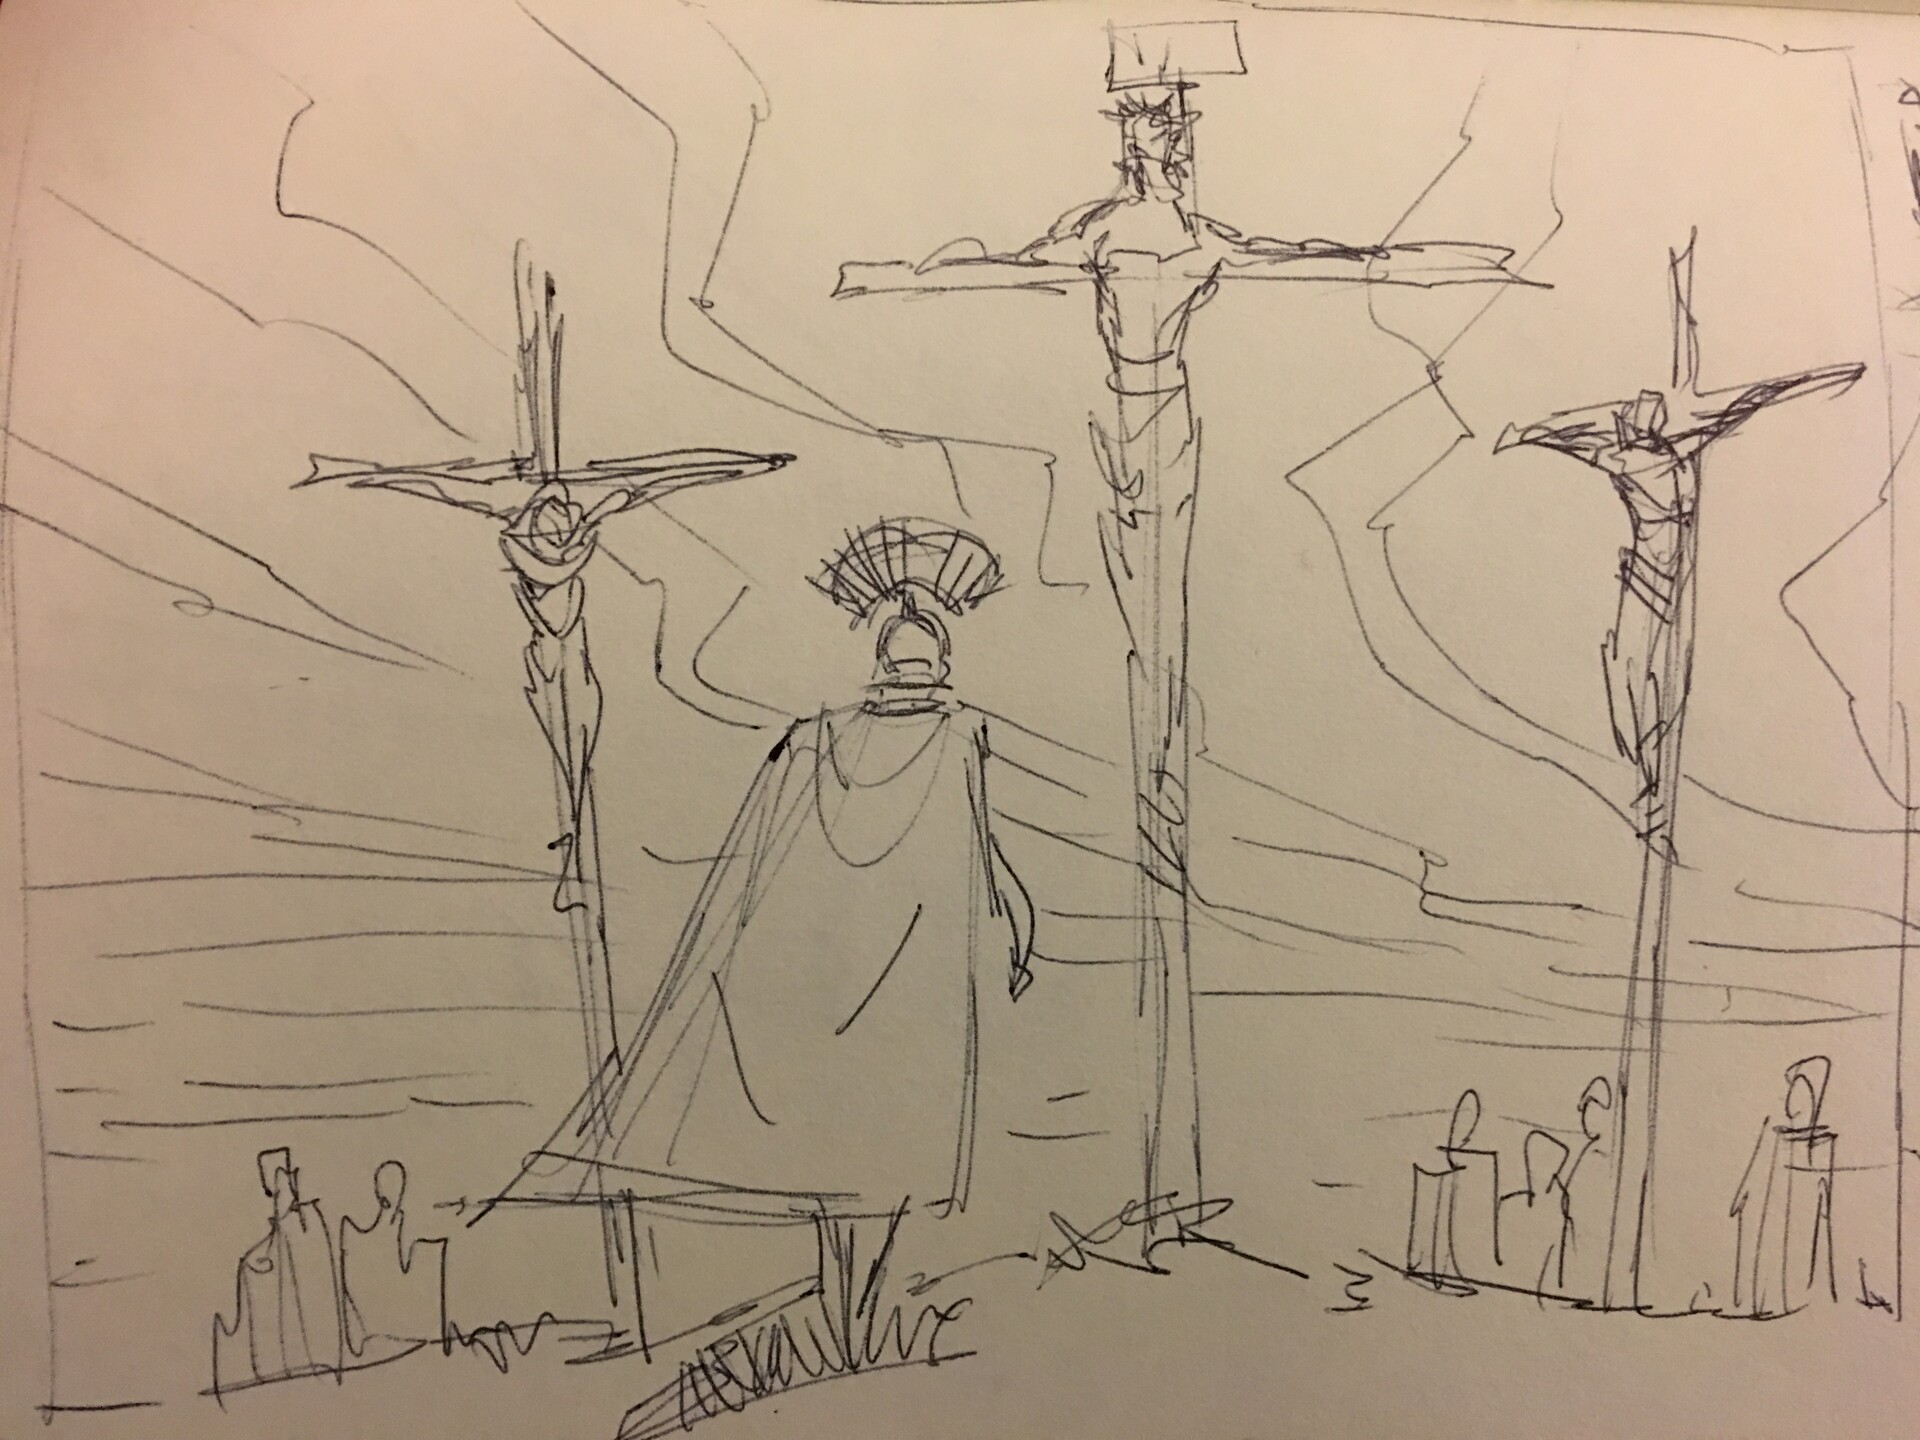 Original ballpoint pen sketch.